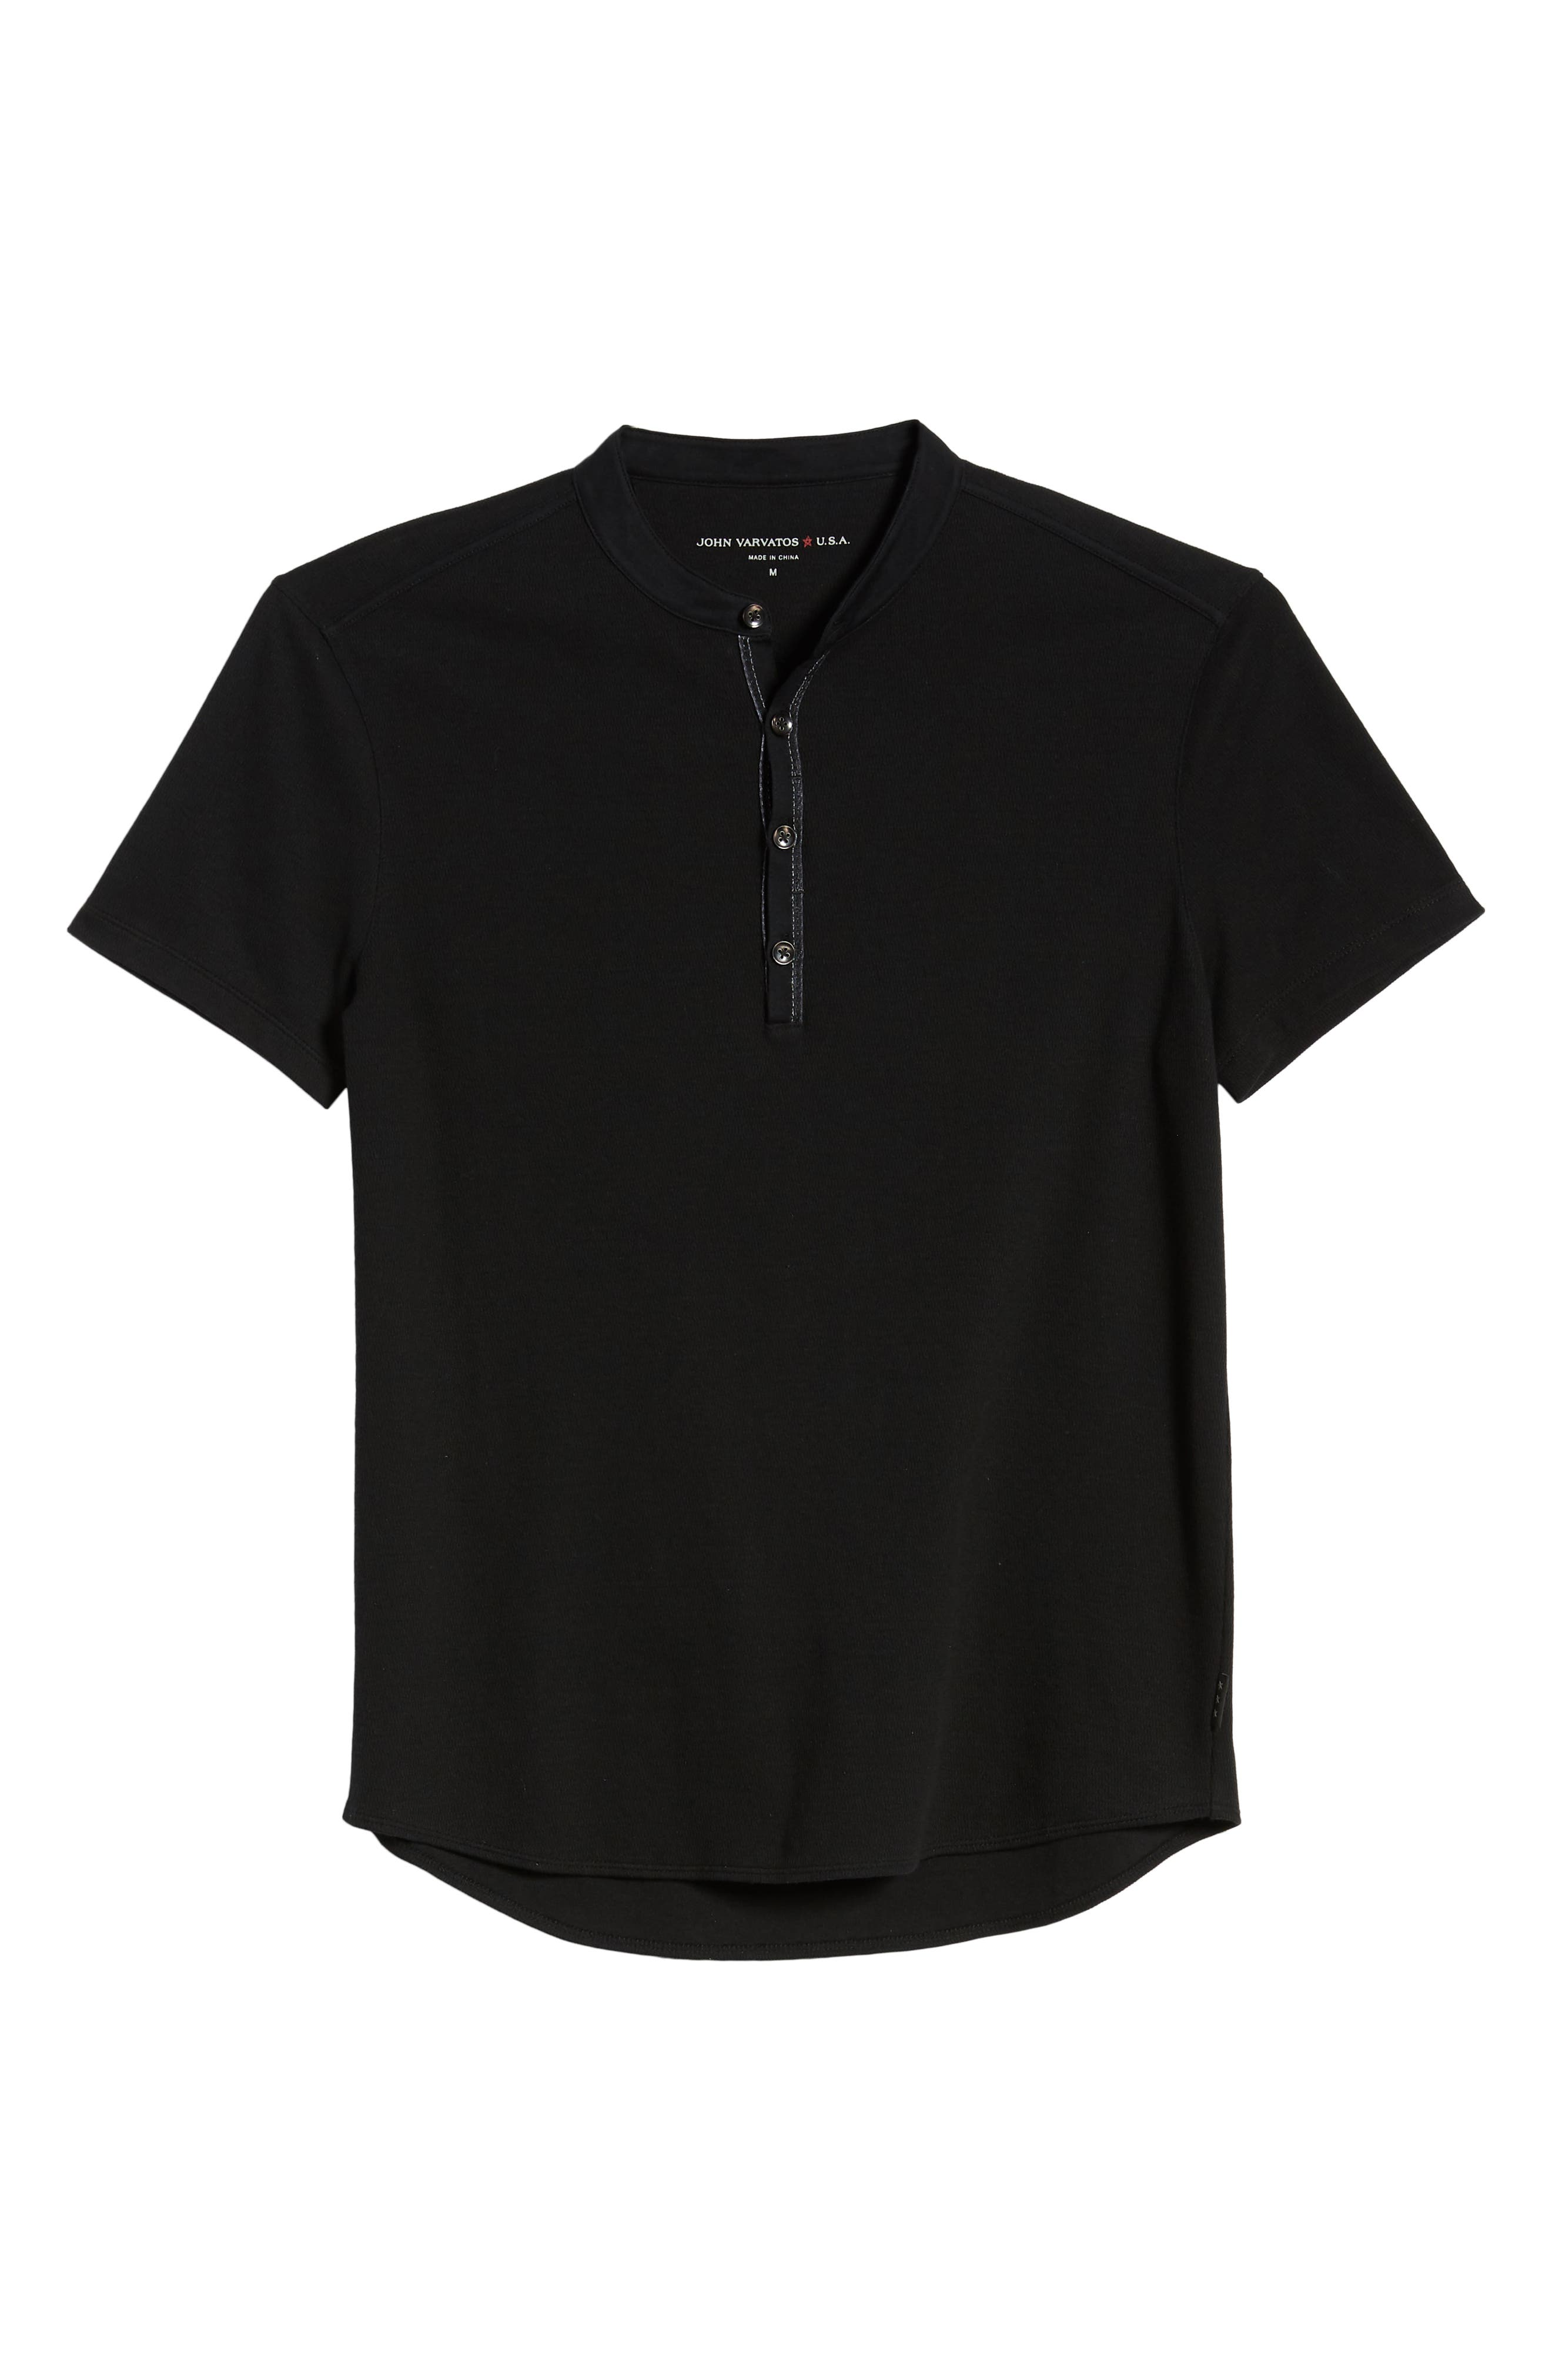 a9bbc6b7b2e995 Men's John Varvatos Star USA T-Shirts, Tank Tops, & Graphic Tees   Nordstrom